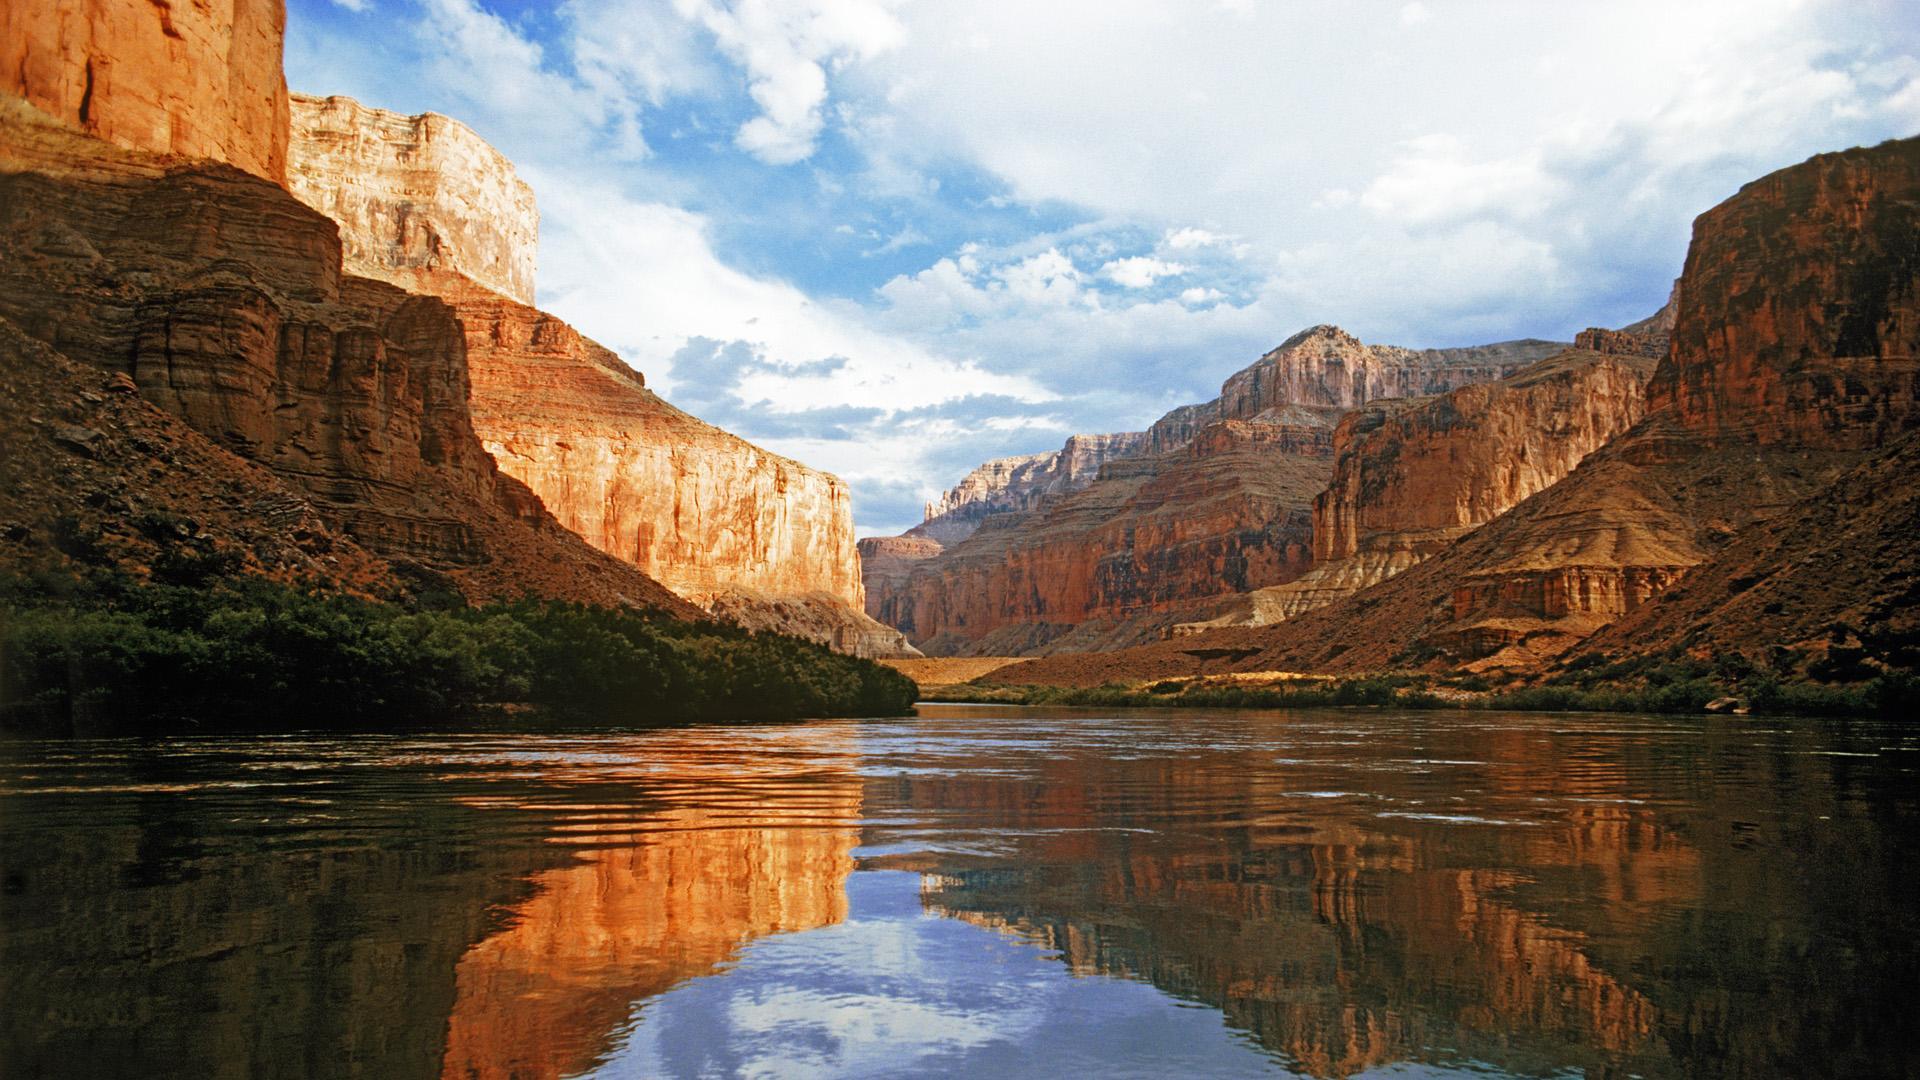 Great Wallpaper Mountain Windows Vista - Wildest-destinations-you-must-travel-to-Rocky-Mountain-National-Park-Colorado  Gallery_518293.jpg